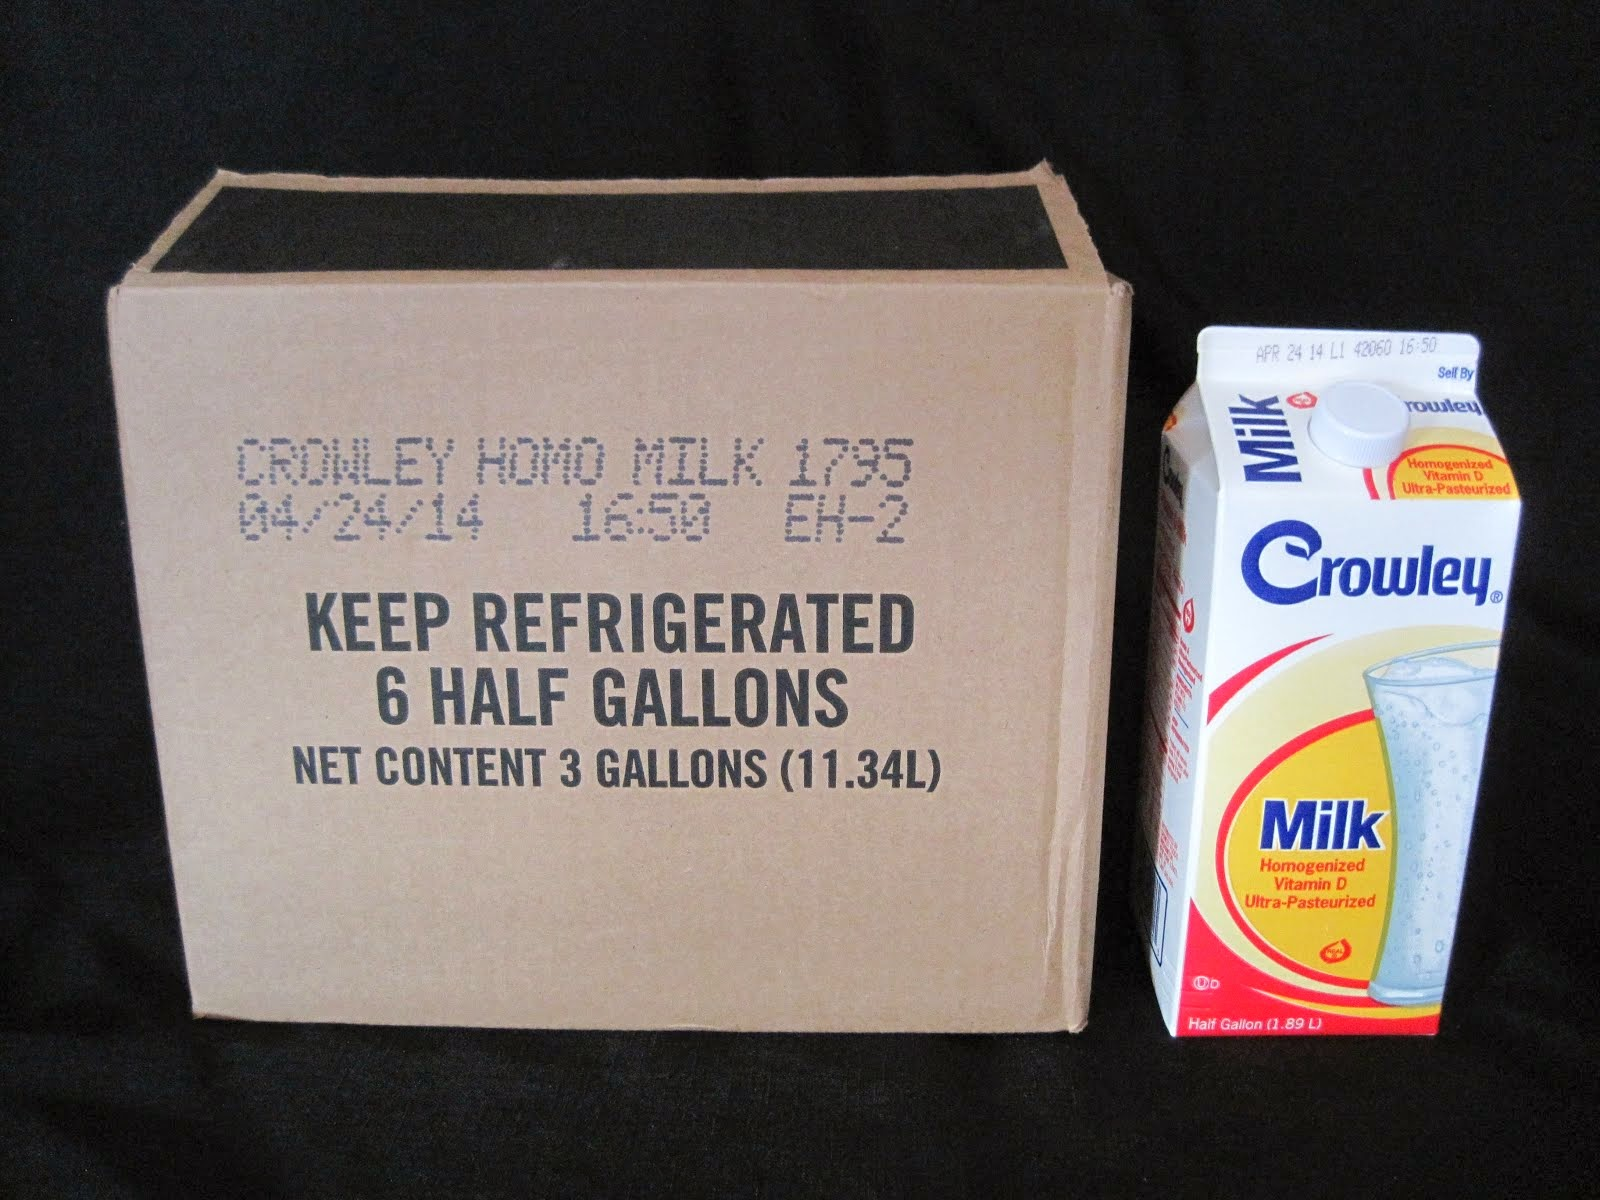 Ultra Pasterized Whole Milk 6-1/2 gal - 6 week Shelf life - Item # 43130